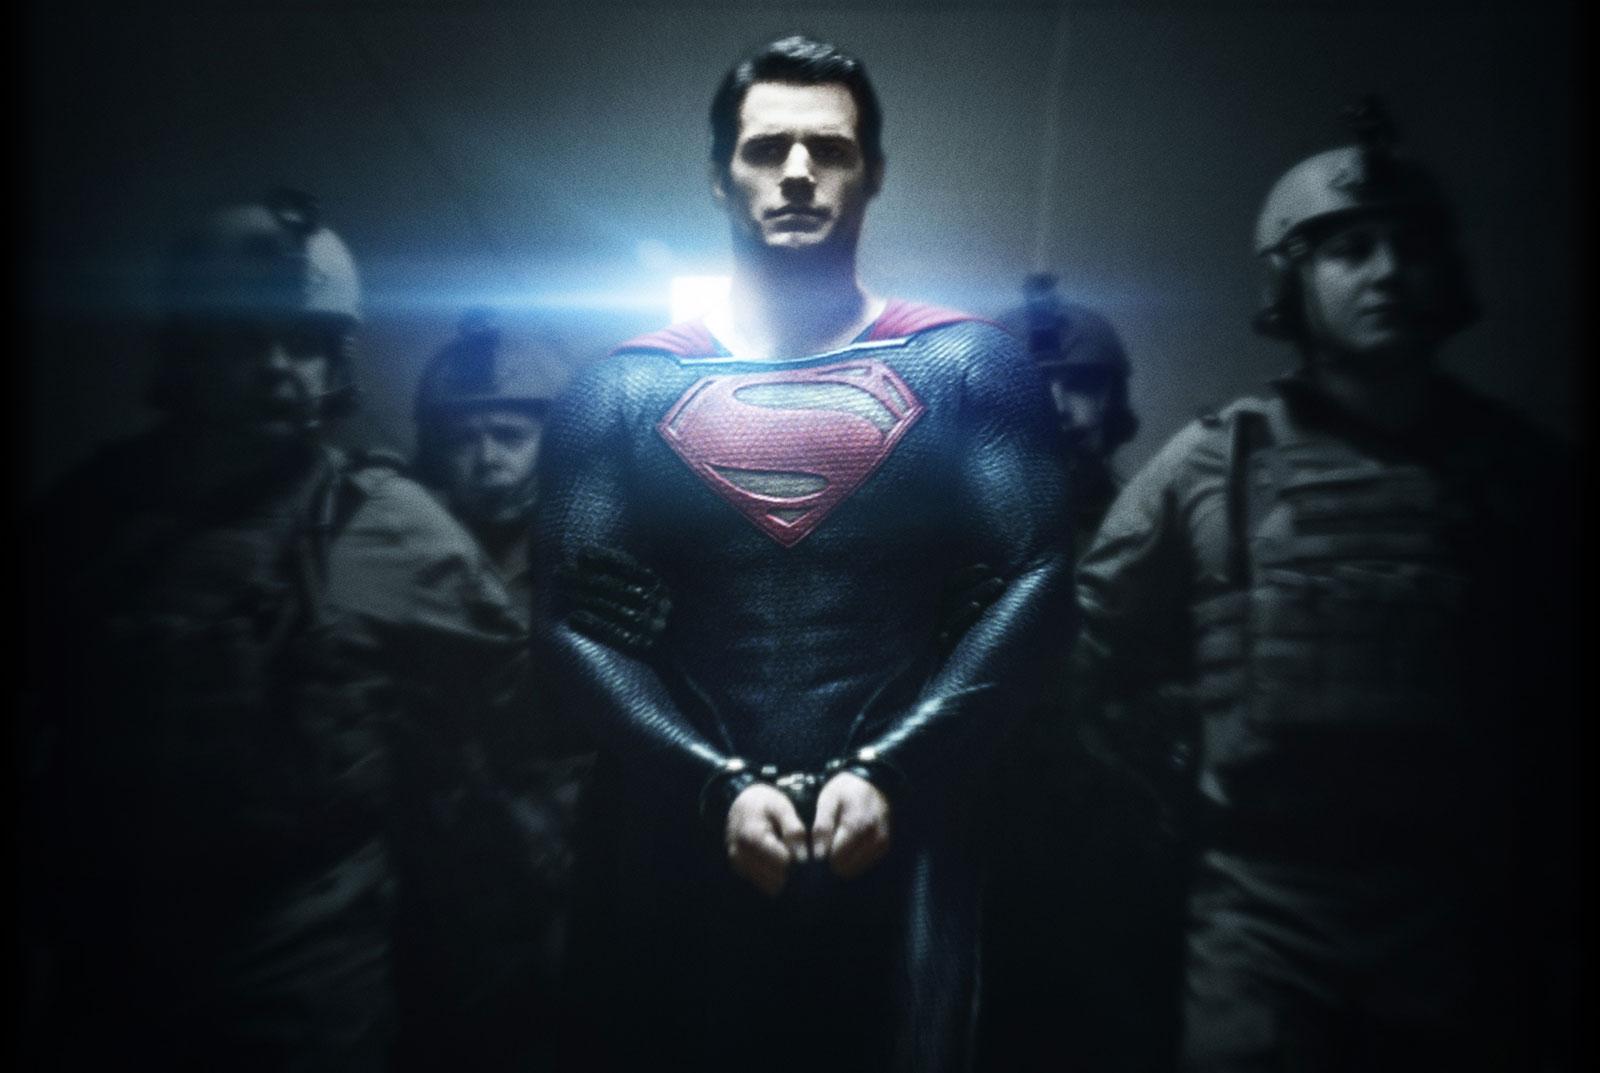 Superman Man of Steel 2013 Movie Wallpaper 6 1600x1073